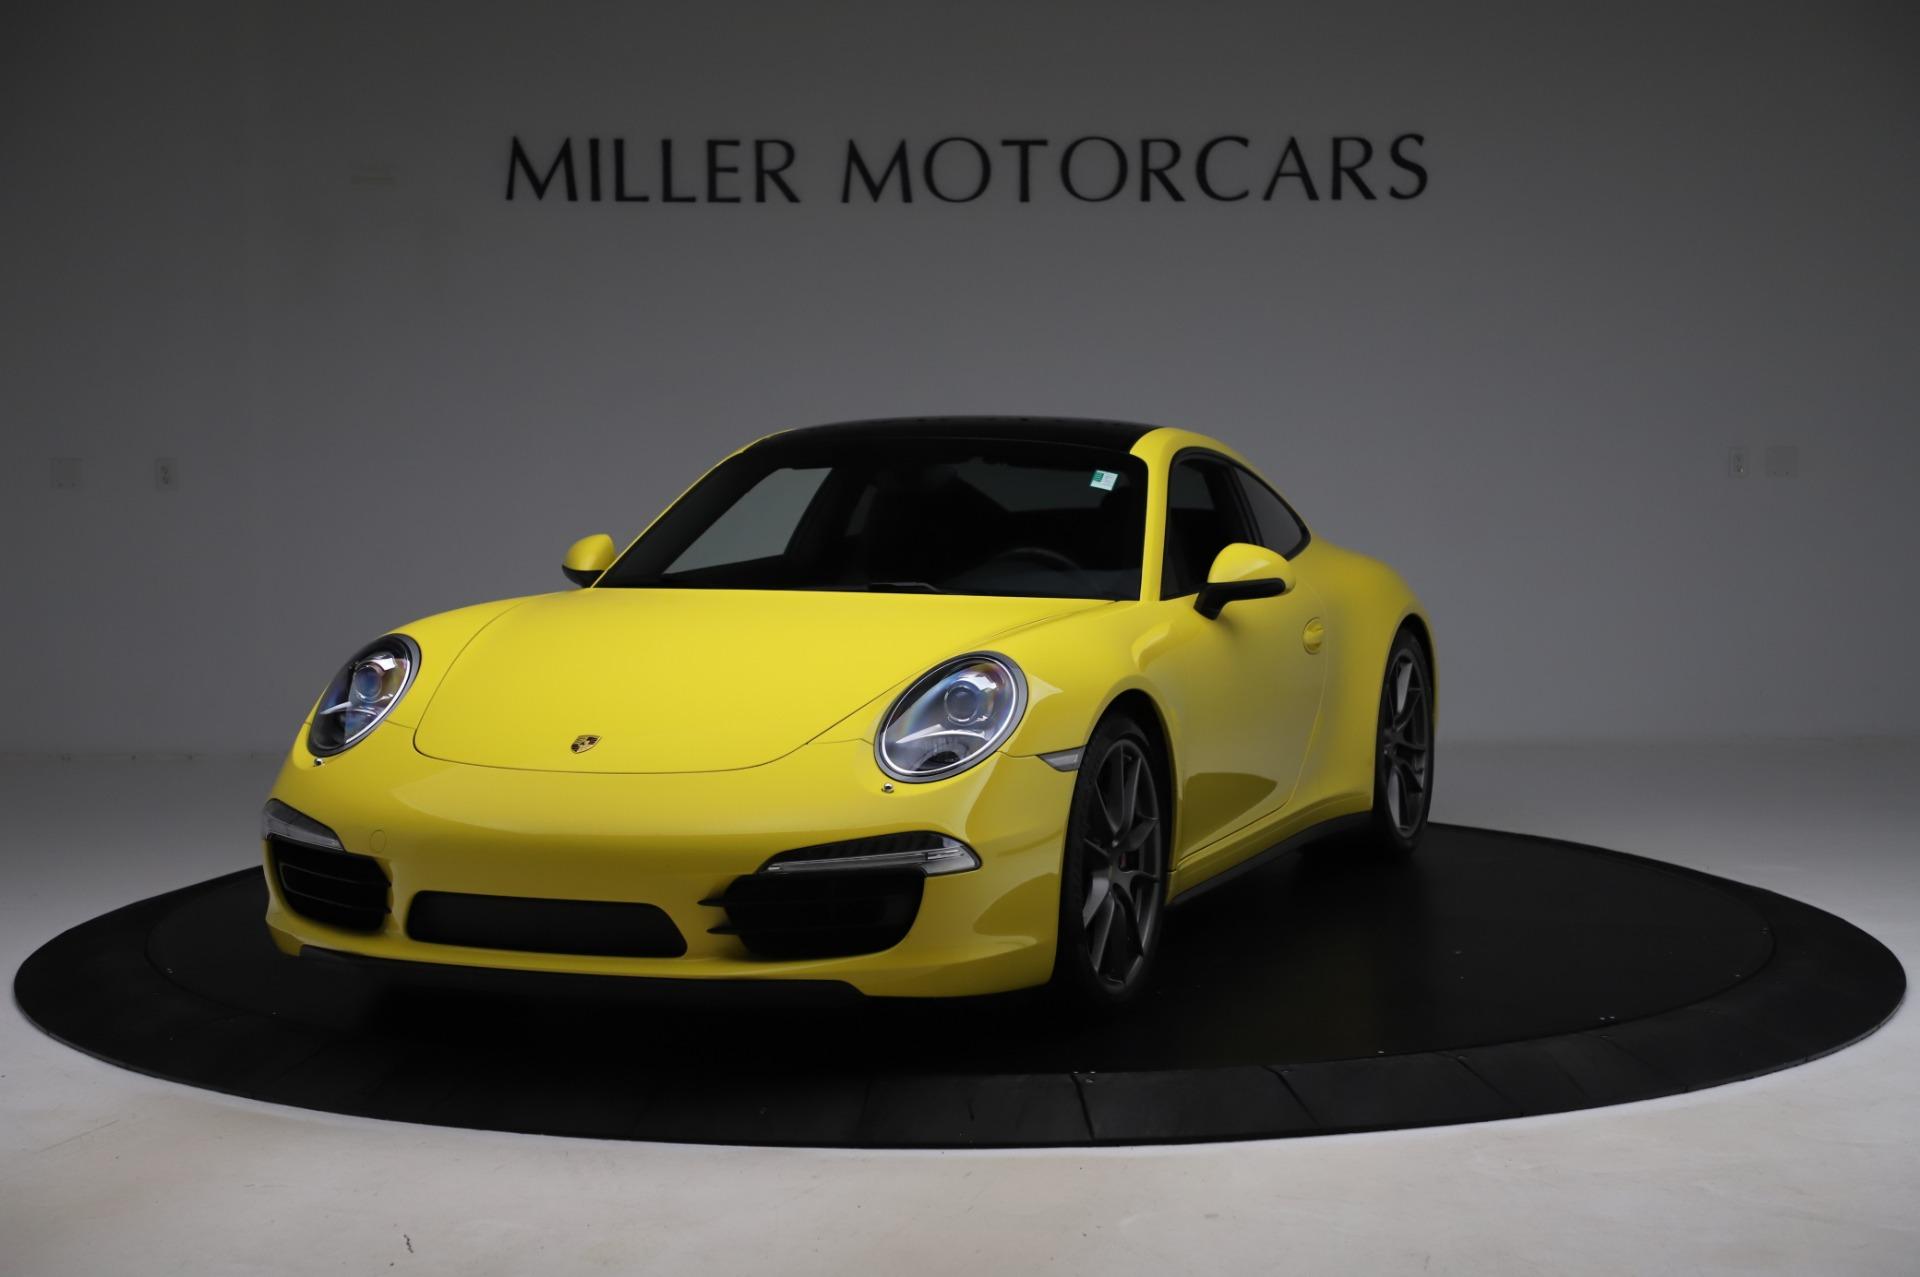 Used 2013 Porsche 911 Carrera 4S for sale Call for price at Alfa Romeo of Westport in Westport CT 06880 1